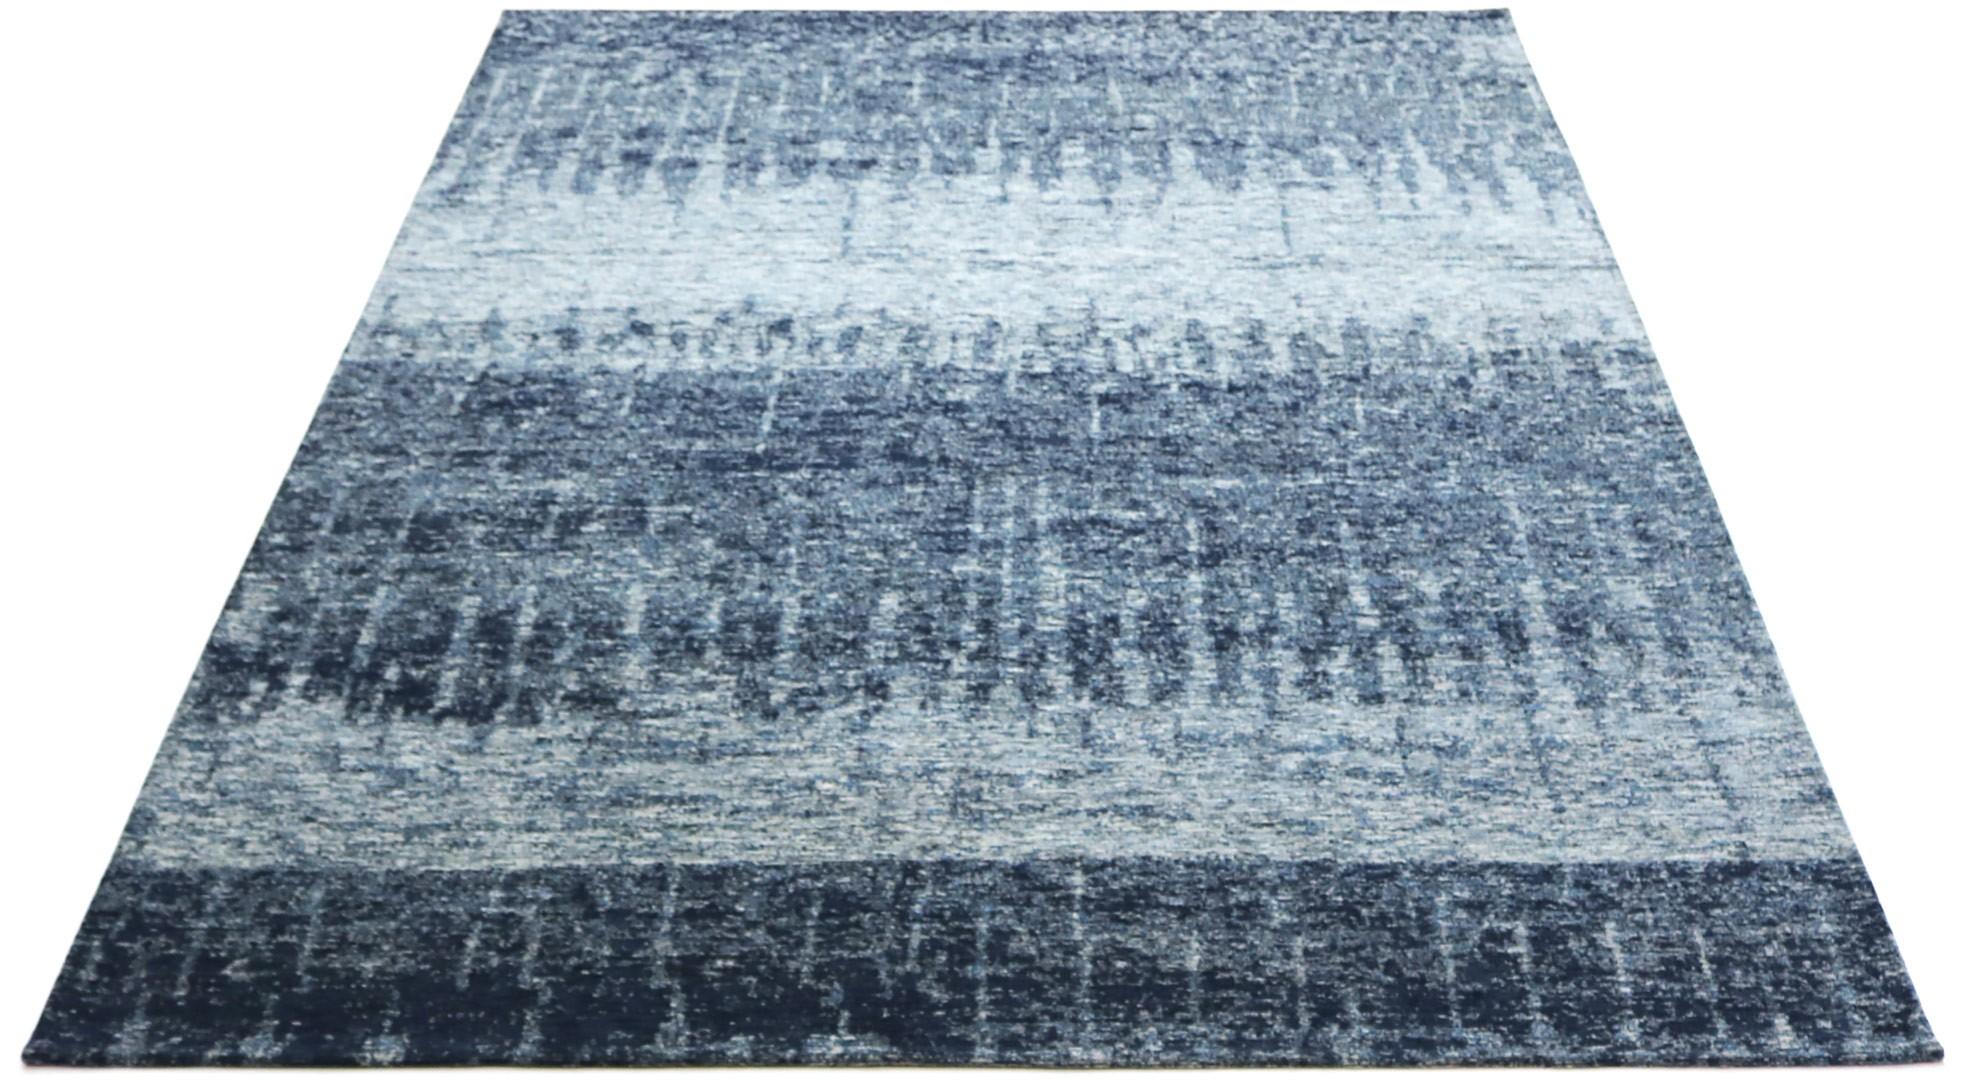 tapis grande taille wonderful tapis grande taille 9 tapis de salon de grande tapis de bain. Black Bedroom Furniture Sets. Home Design Ideas